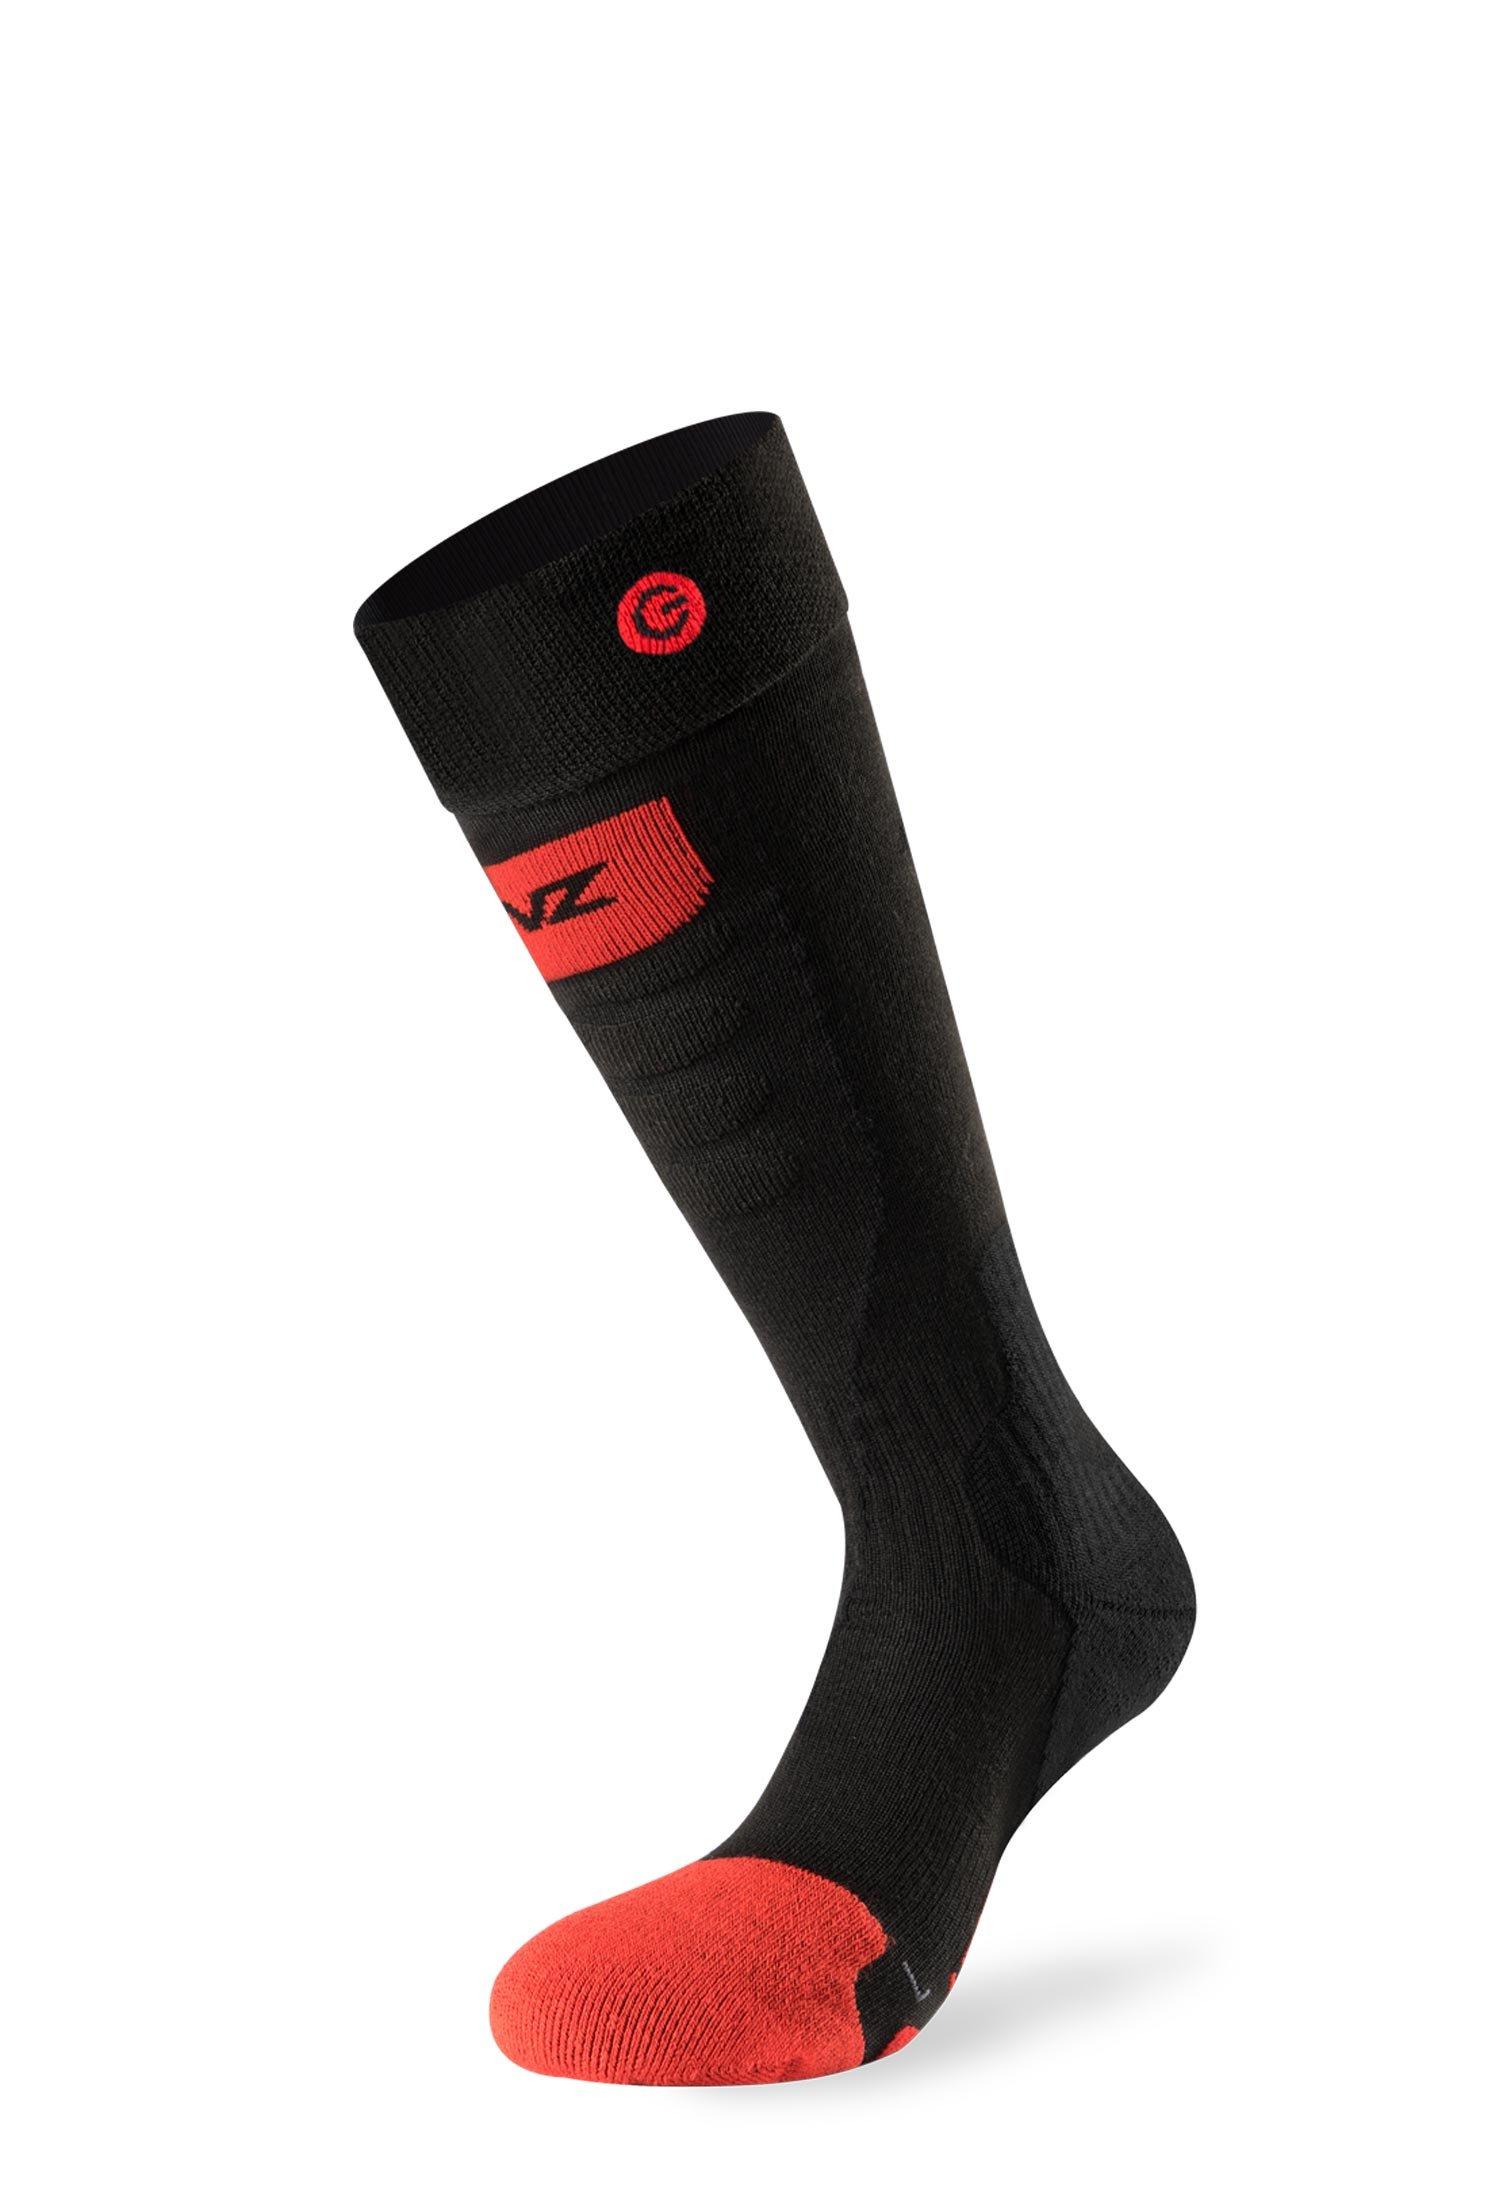 Vyhrievané ponožky Lenz Heat Socks 5.0 Toe Cap Slim Fit